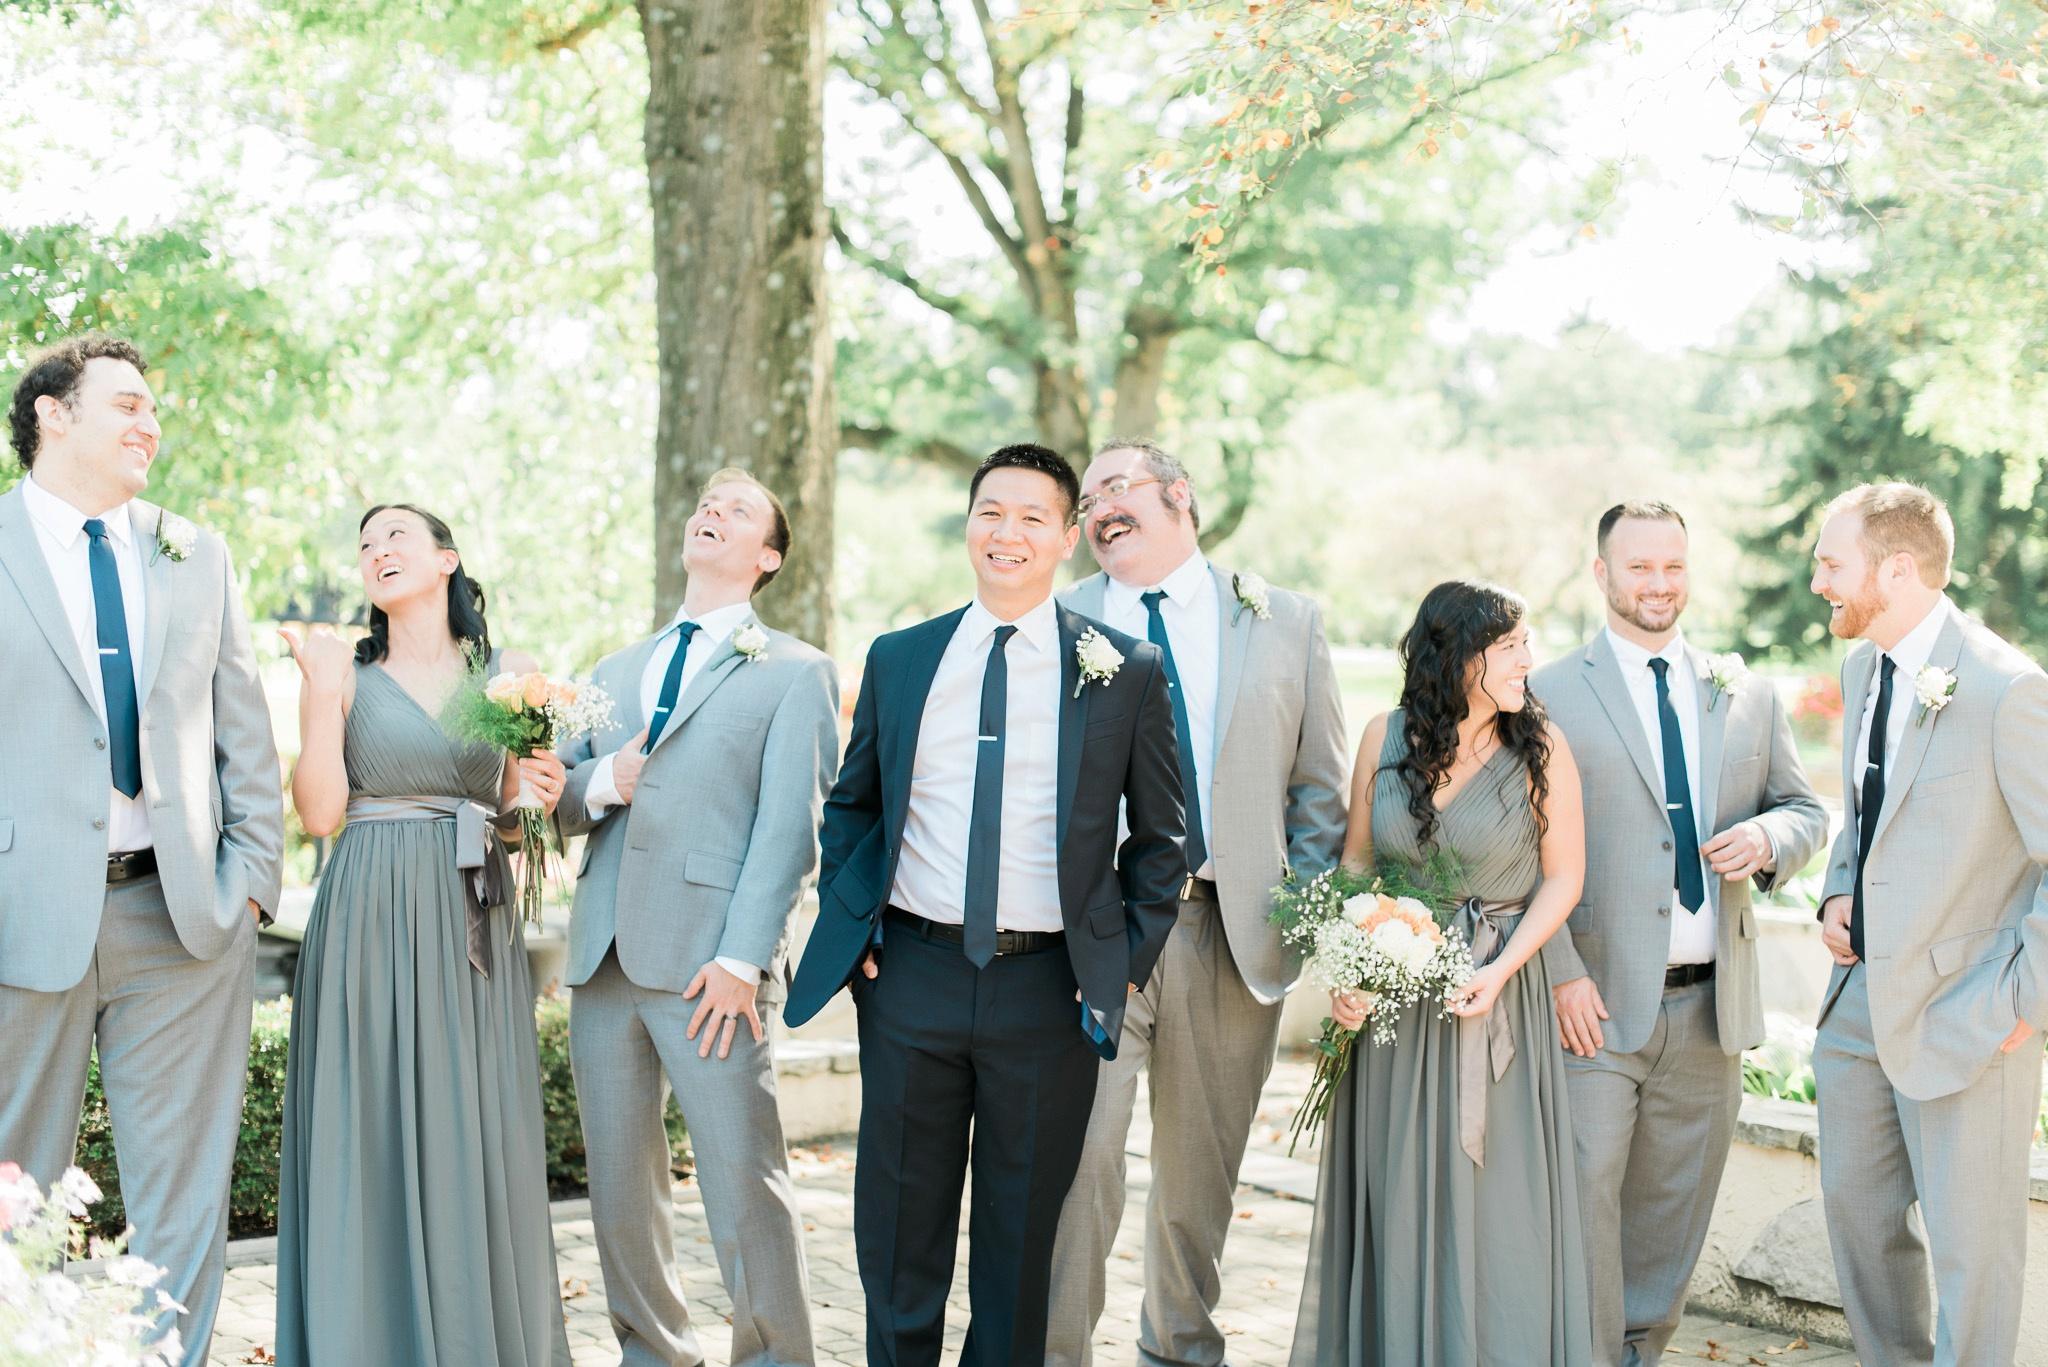 brookside-golf-country-club-wedding-columbus-ohio-38.jpg